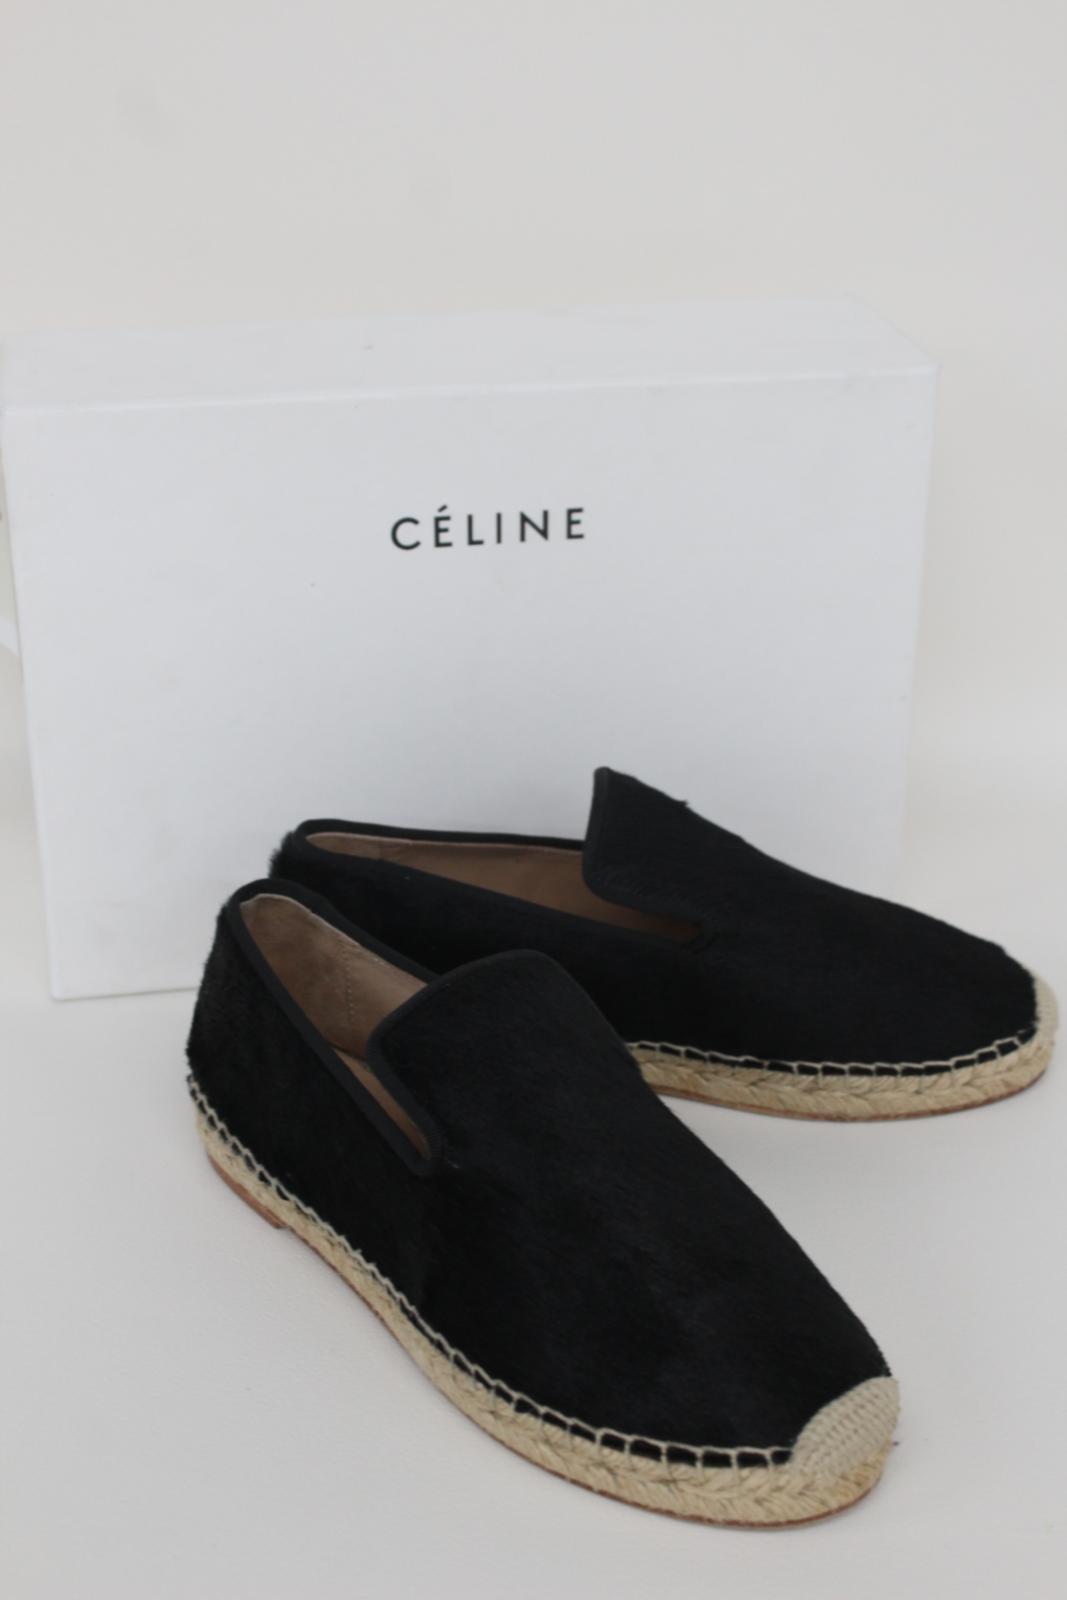 CELINE-Stacy-Black-Pony-Hair-Ladies-Flat-Espadrilles-Shoes-UK3-EU36-5-BNIB thumbnail 3